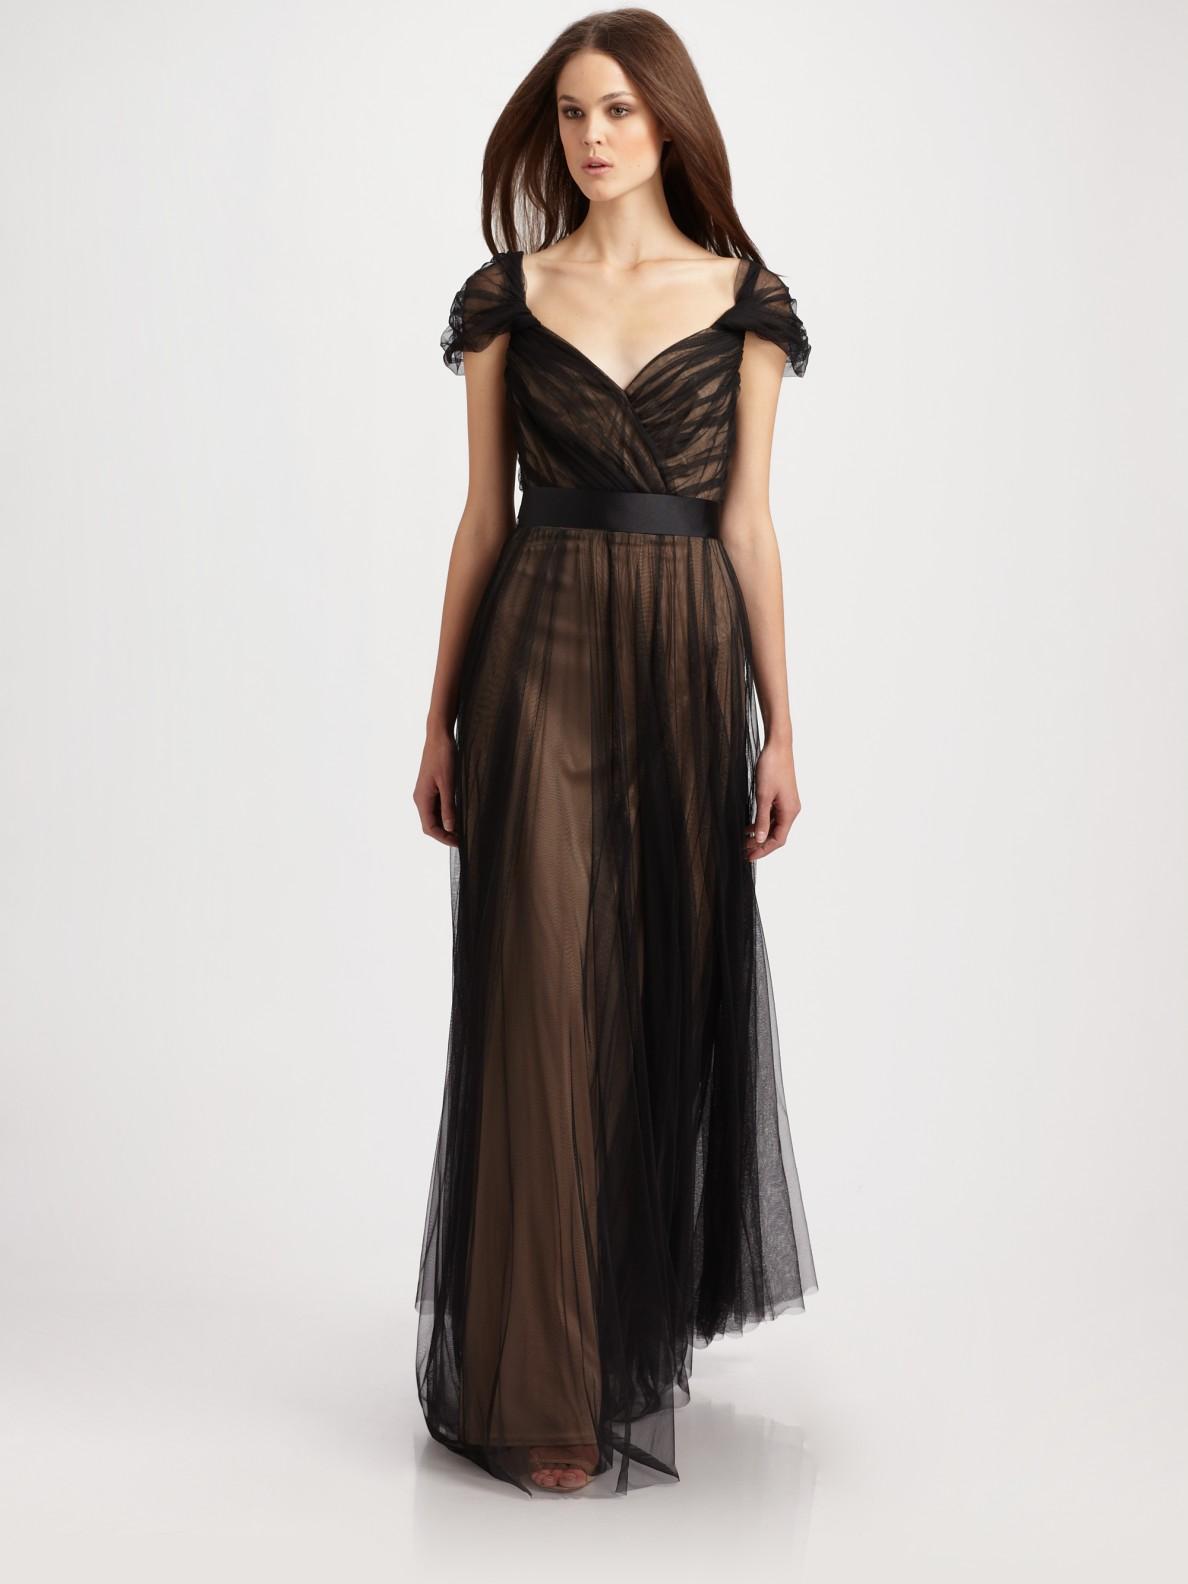 62d536c9b9c Lyst - Tadashi Shoji Tulle Cap Sleeve Gown in Black